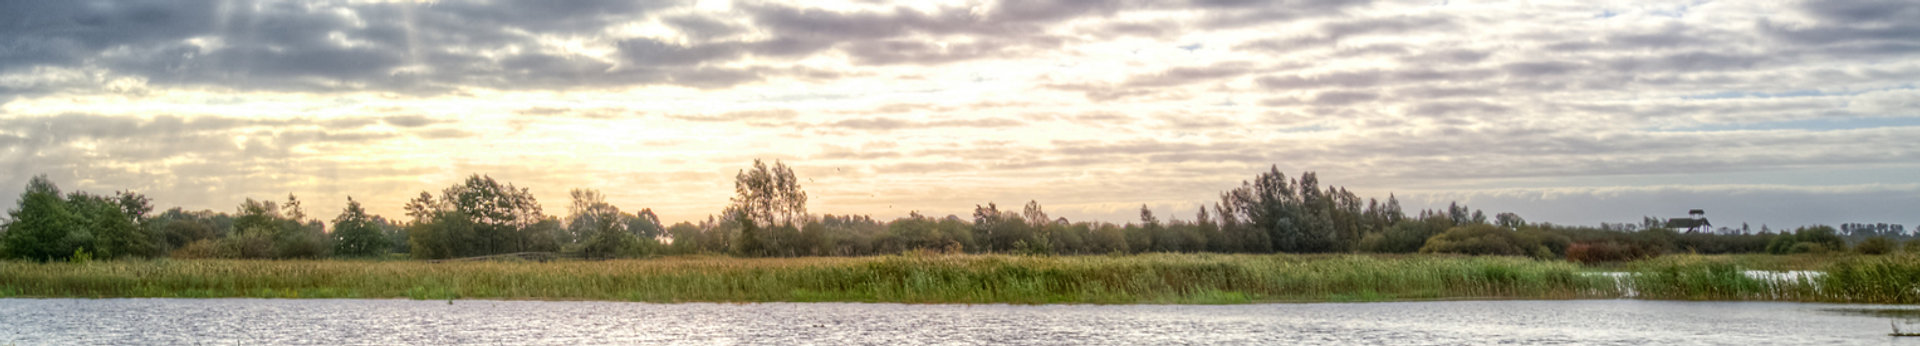 swamp-morning-water-reflection-633888_ed